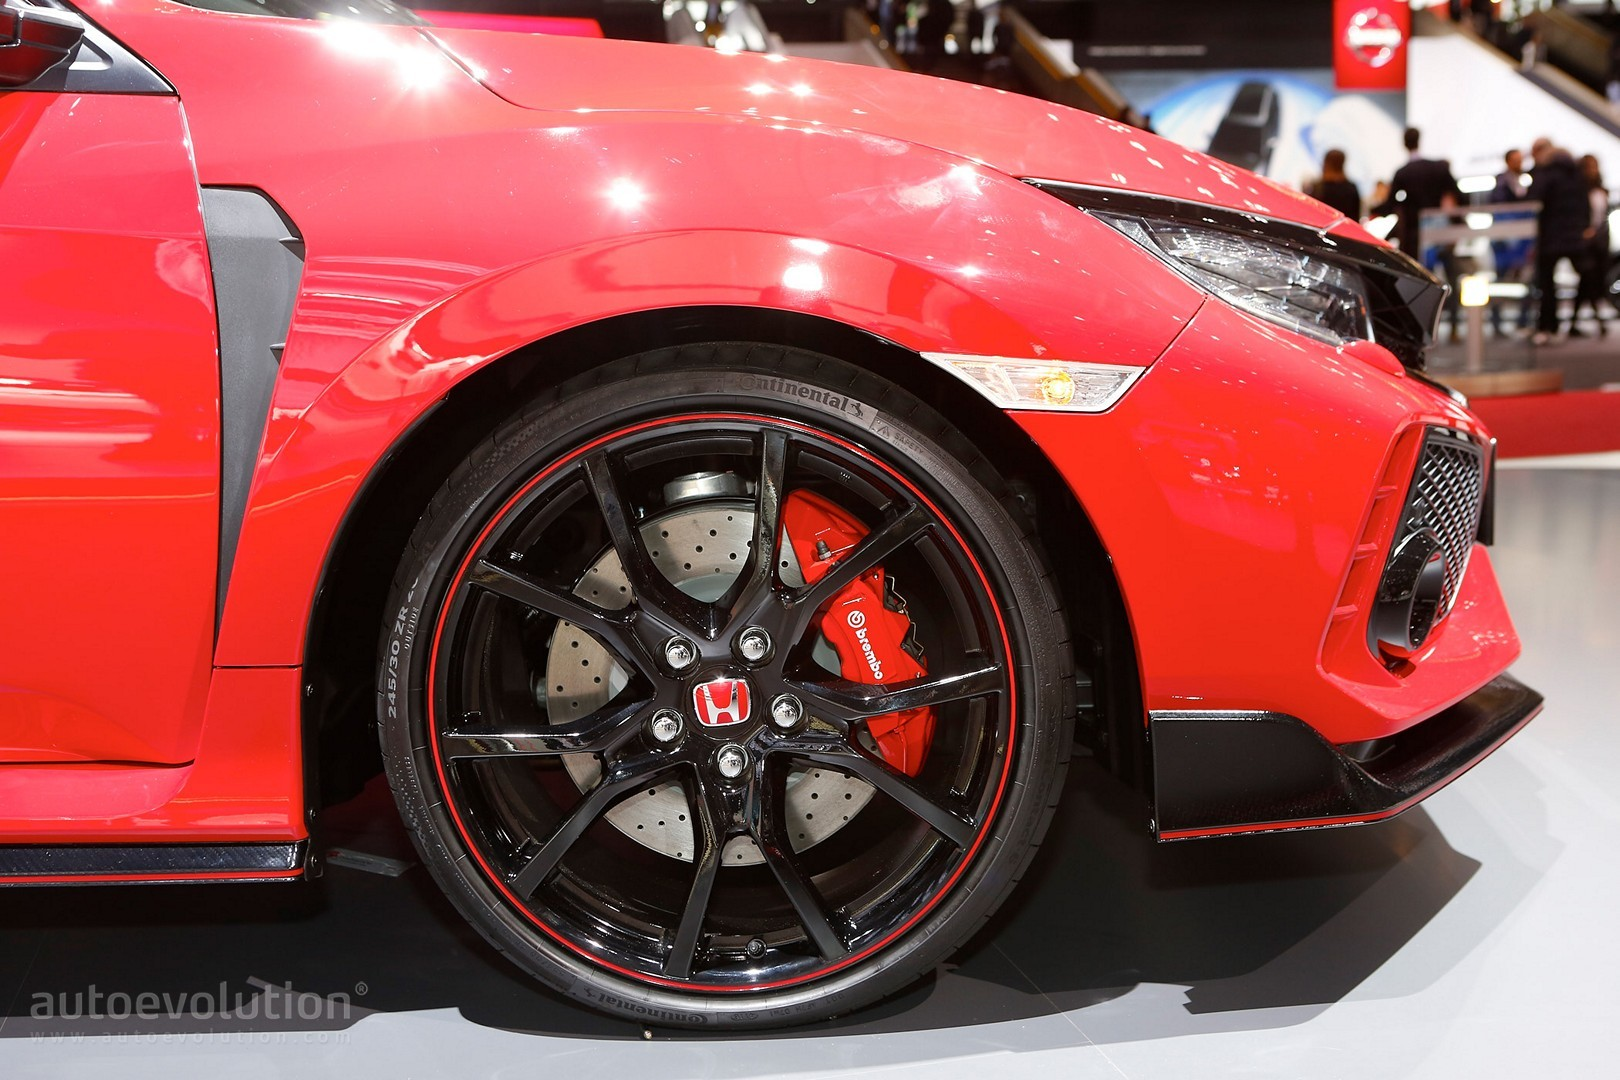 Cheaper Honda Civic Type R apparently revealed in NHTSA filings